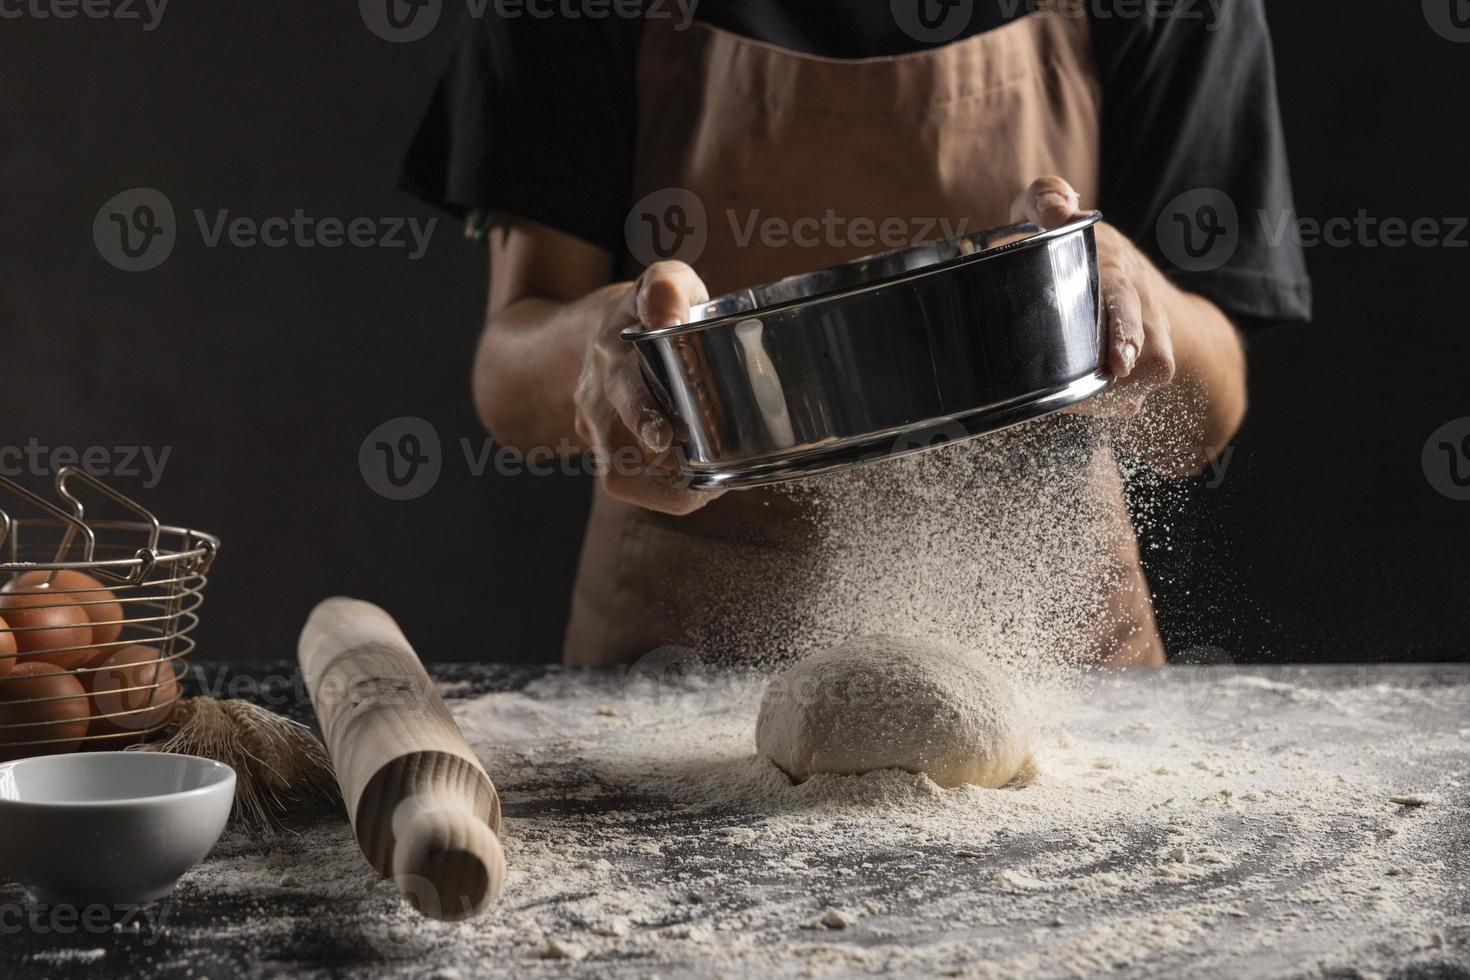 chef-kok bloemdeeg afstoffen foto